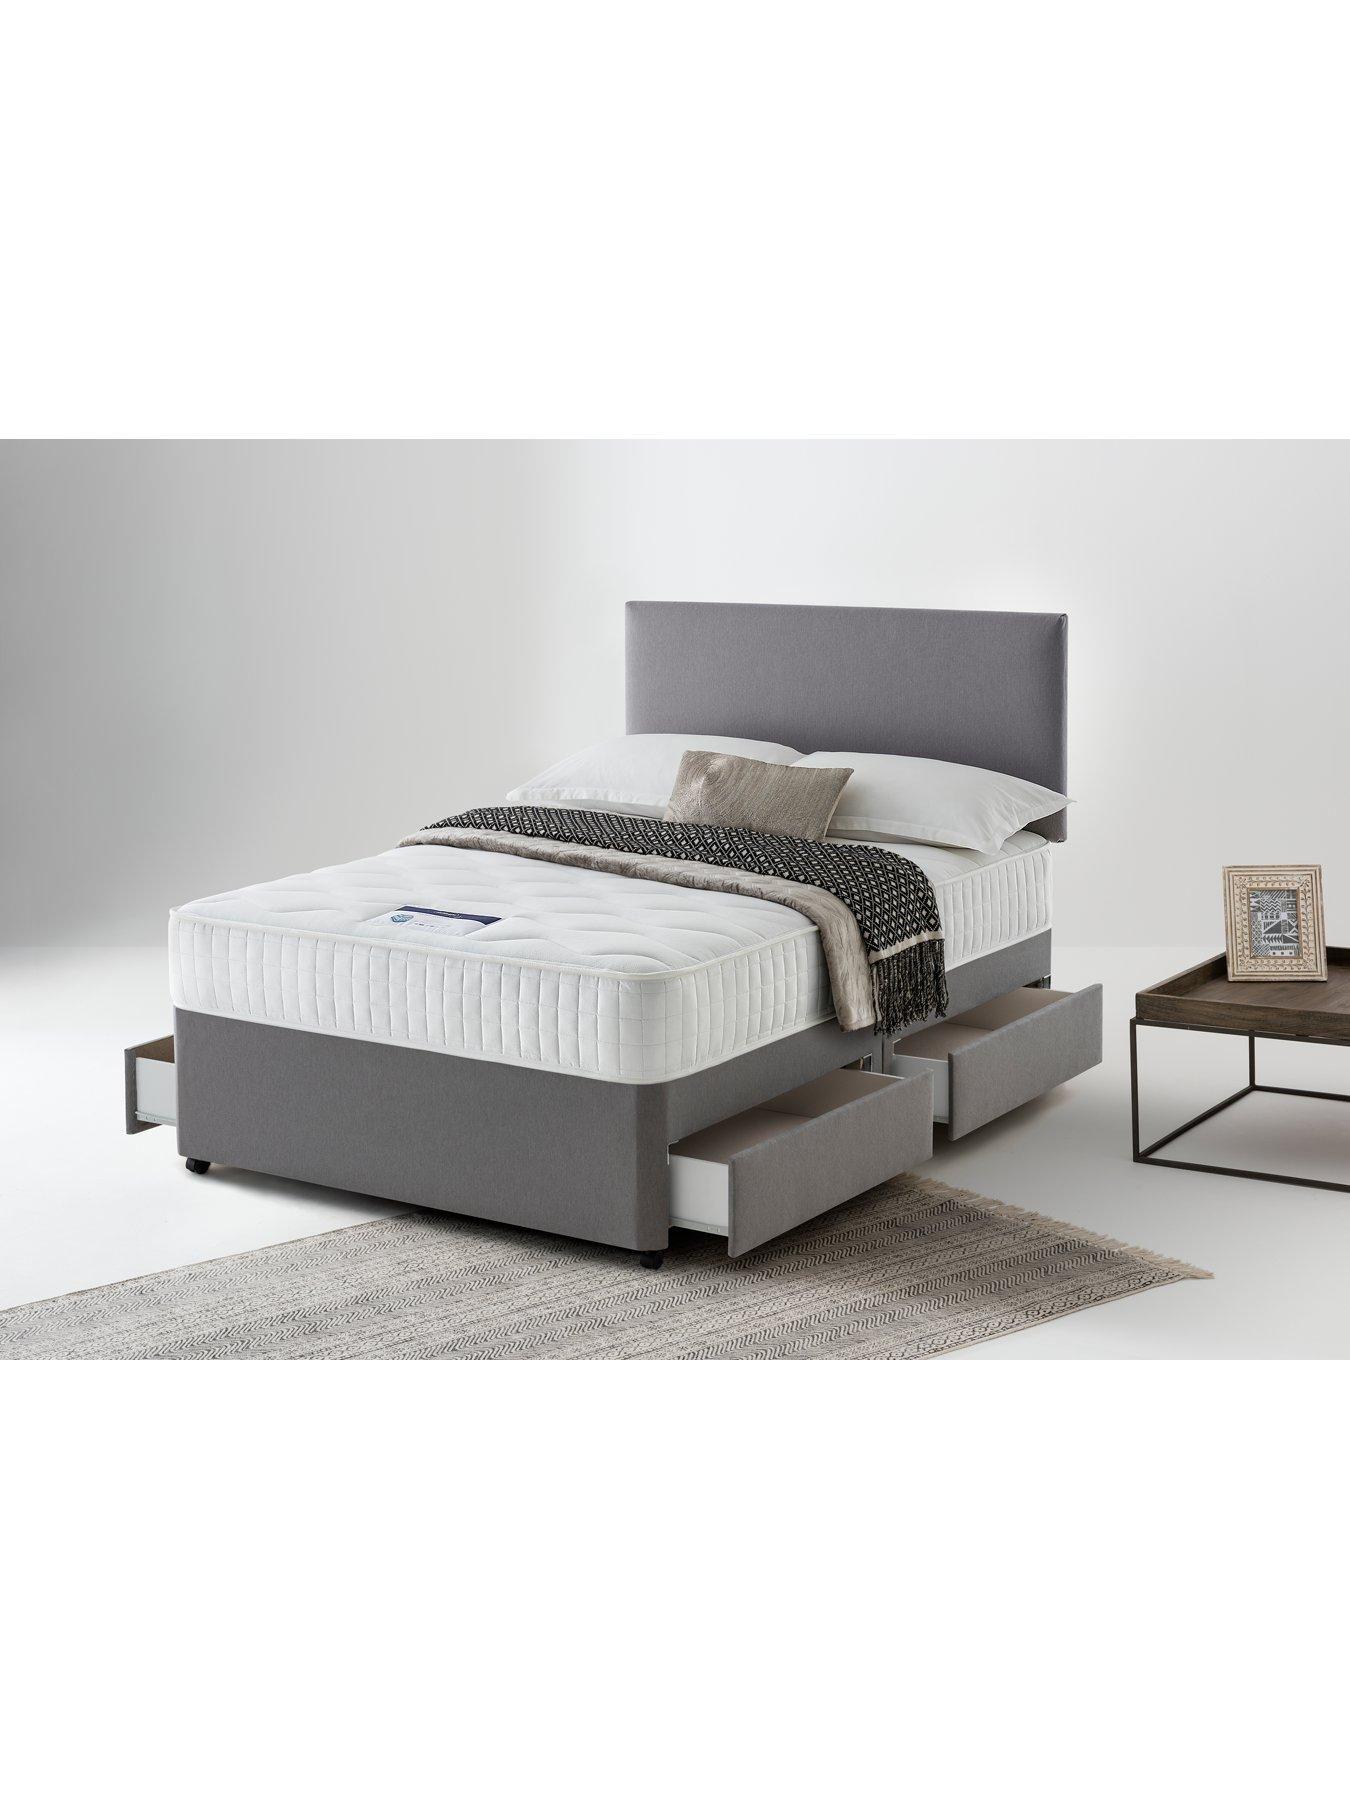 Silentnight Mirapocket Mia 1000 Pocket Luxury Divan Bed With